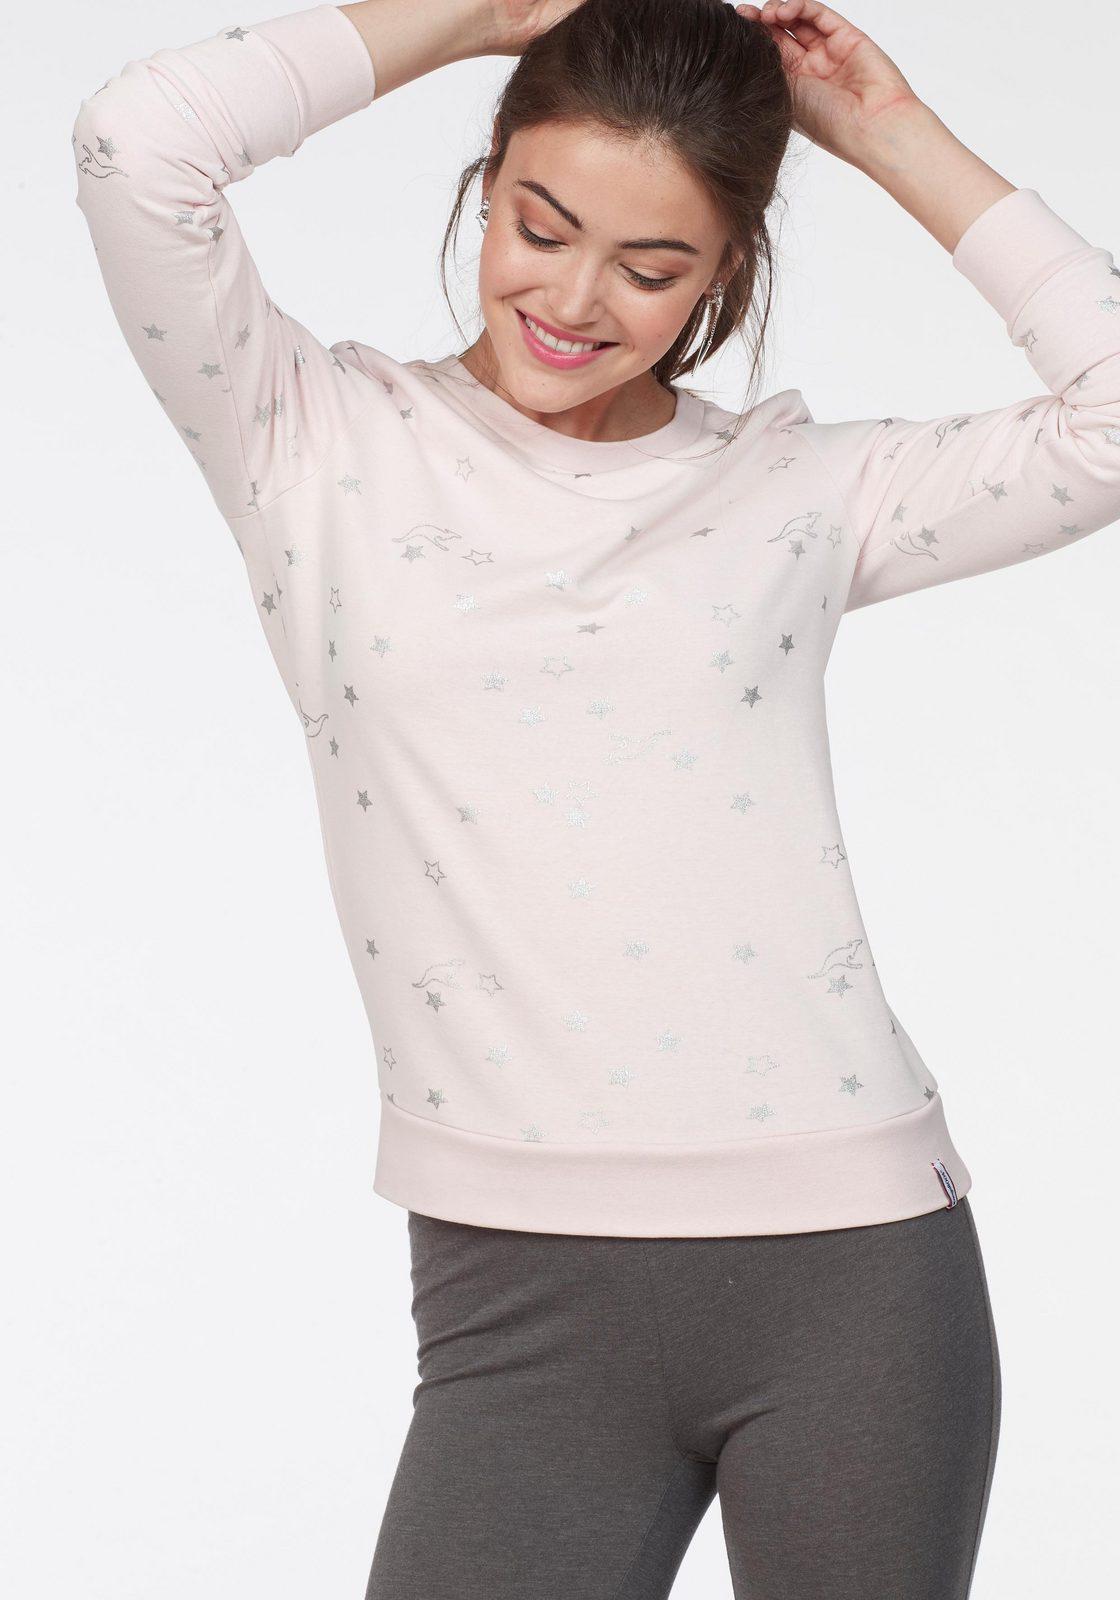 KangaROOS Sweatshirt im Allover-Metallic-Print mit Sternen